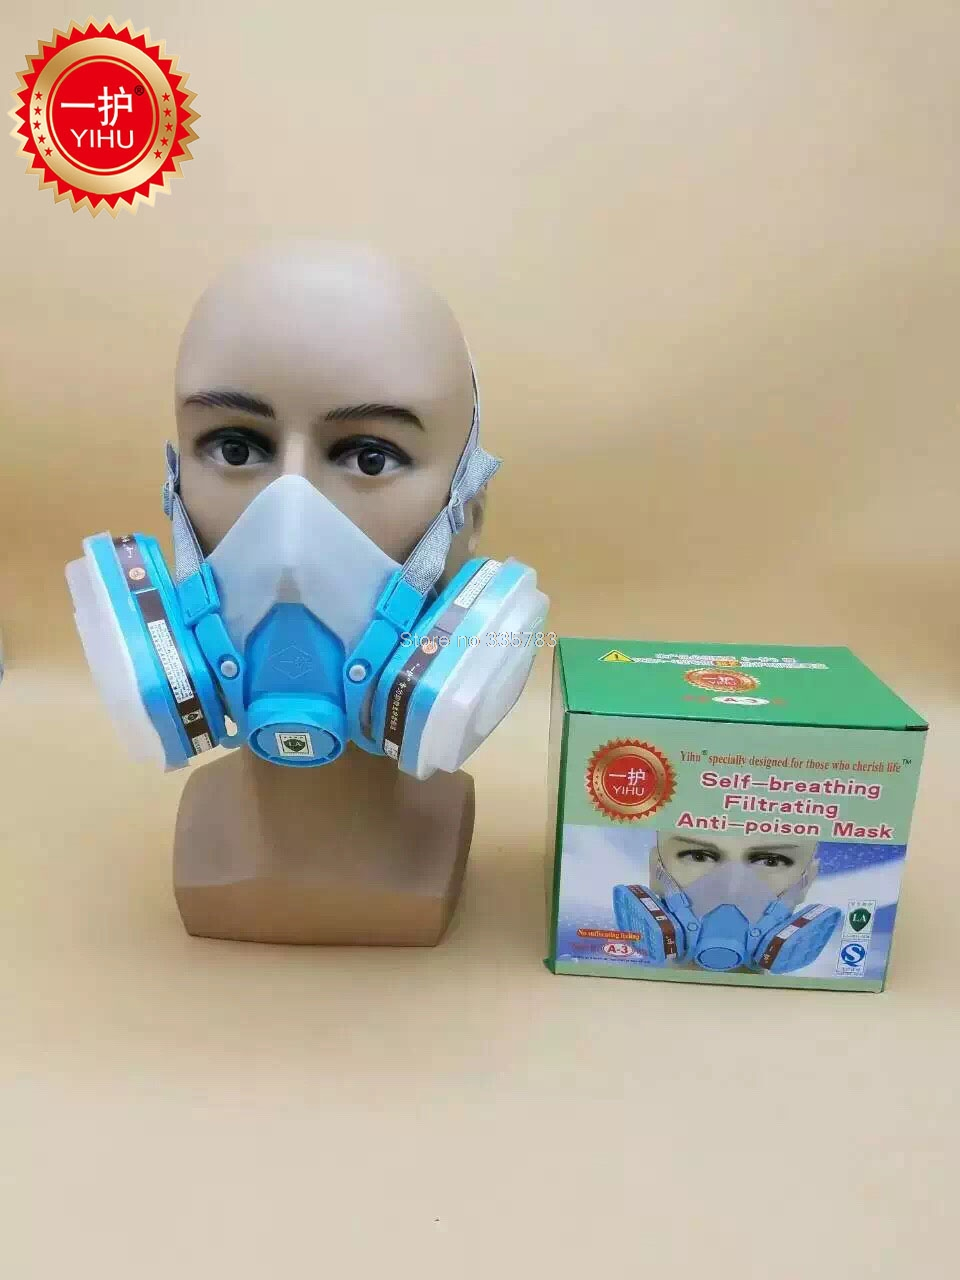 Yihu respirador máscara de gas verde gel de sílice protectora máscara  pesticidas pintura SEGURIDAD INDUSTRIAL respirador mascarilla e9ffefc8ba